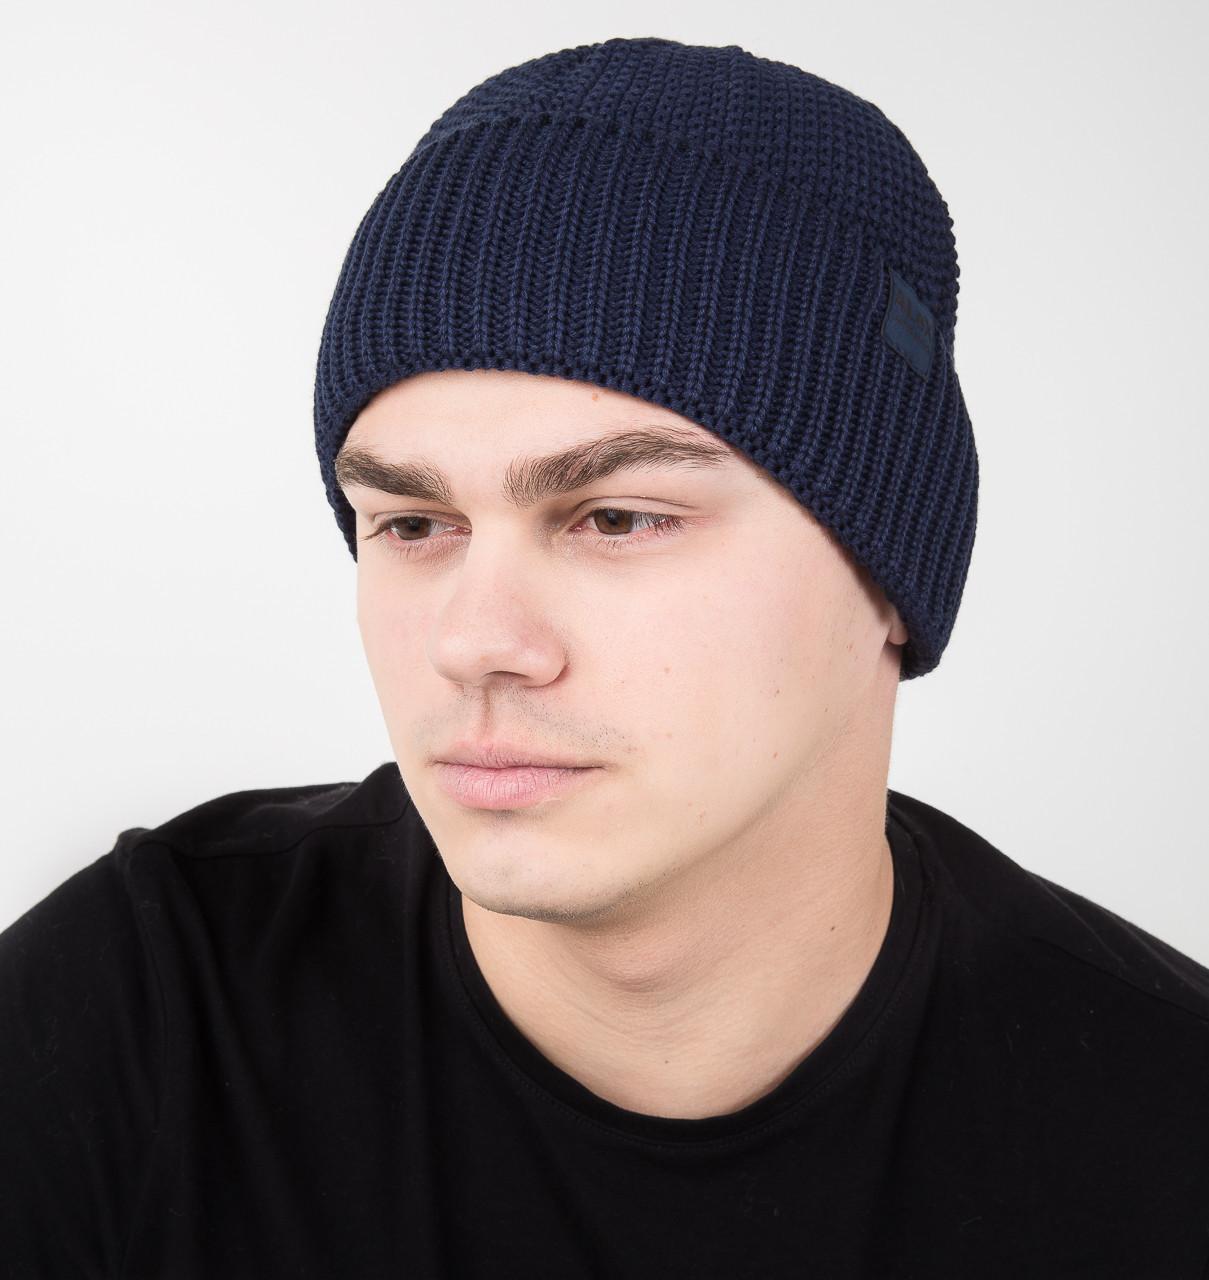 Мужская шапка из вязки на флисе - Арт ач